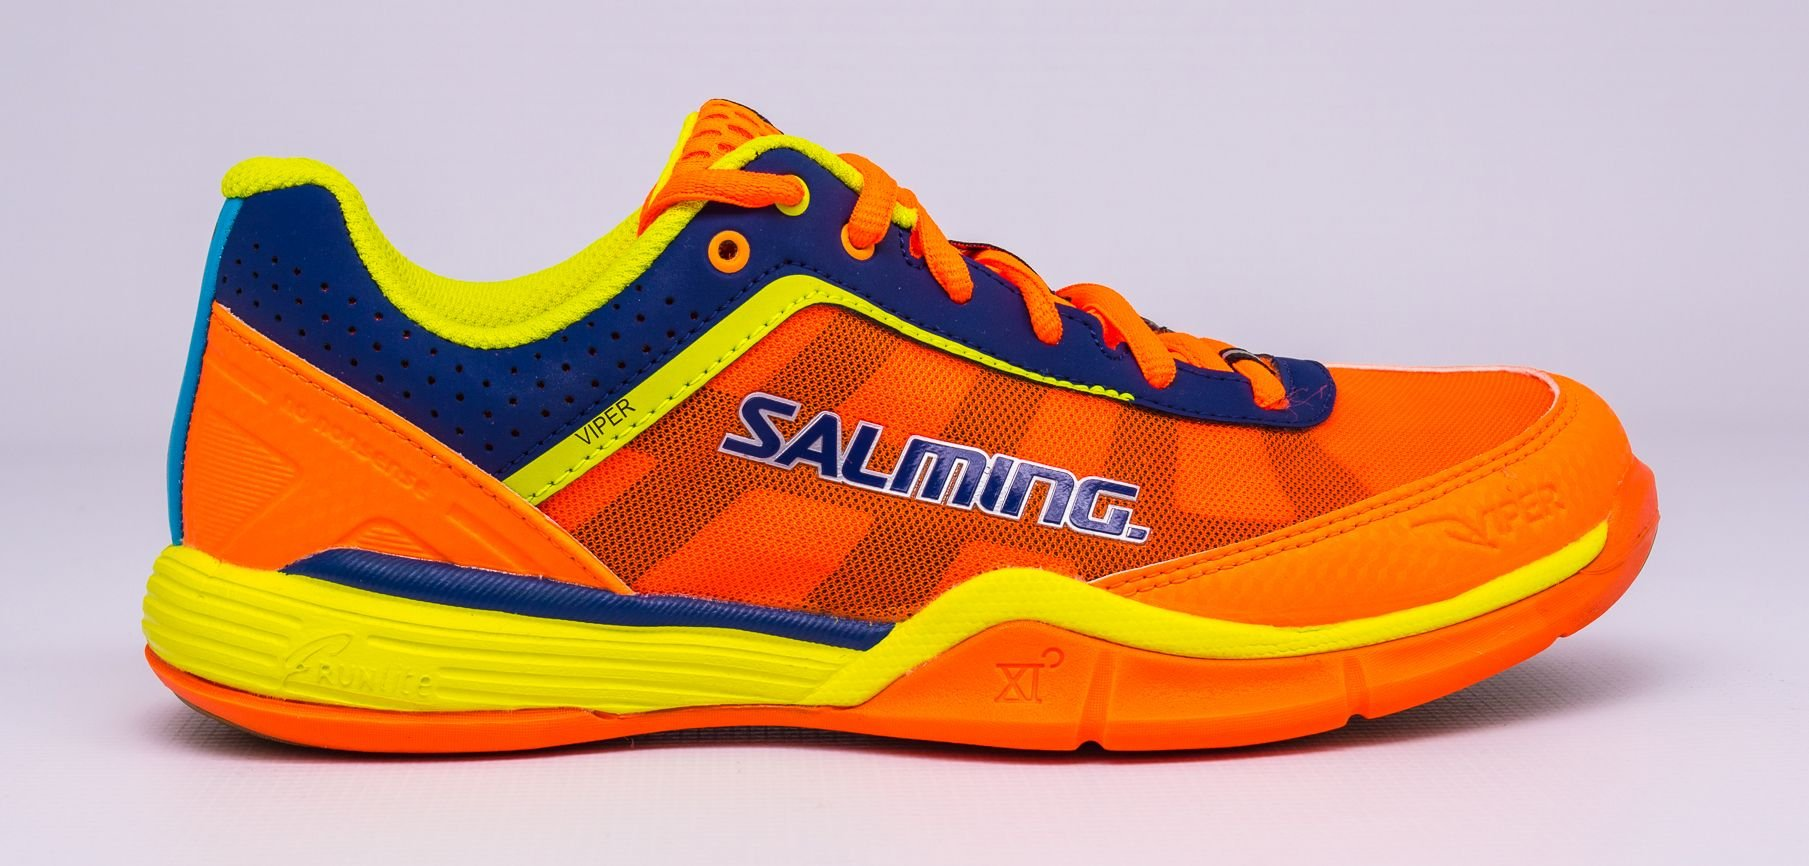 Salming Viper 3 Junior UK 6 / US 6,5 / EUR 39 a 1/3 / CM 25